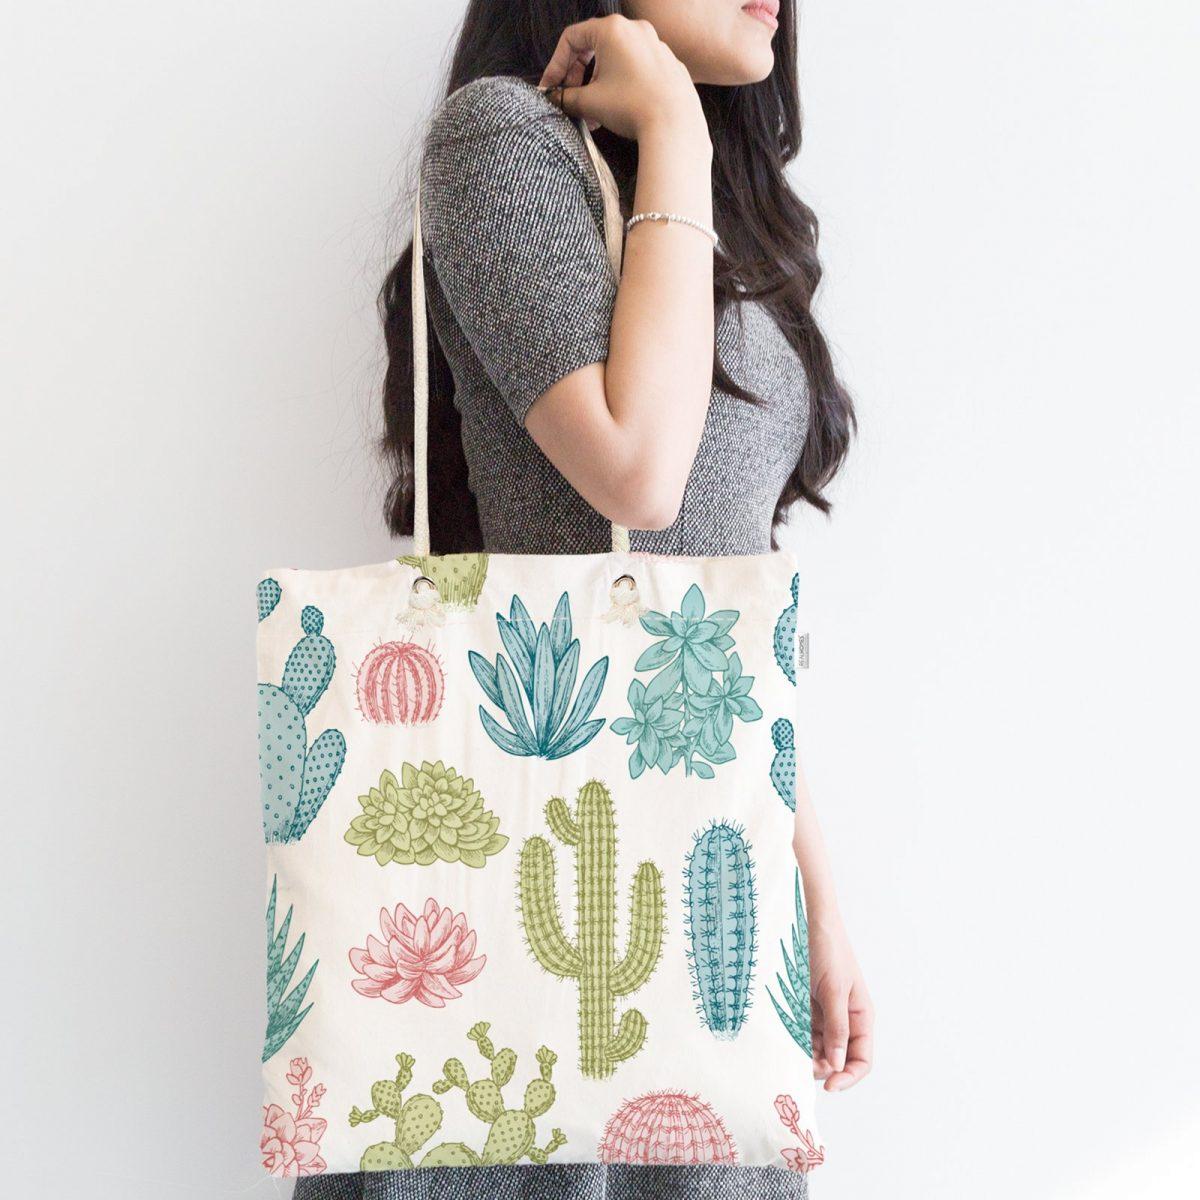 Kaktüs Desenli Renkli Modern Fermuarlı Kumaş Çanta Realhomes